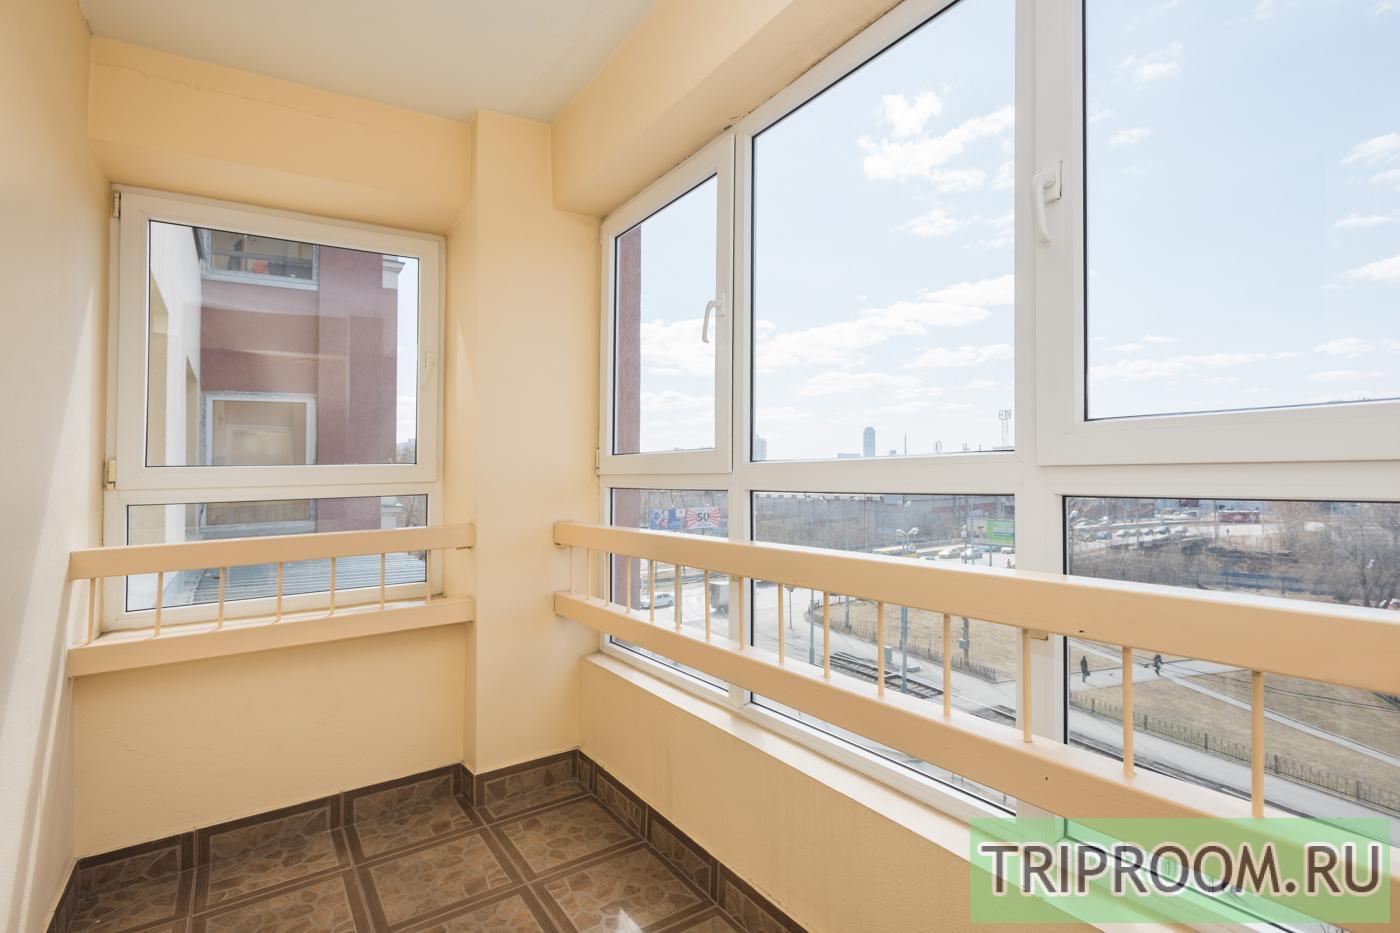 1-комнатная квартира посуточно (вариант № 16259), ул. Смазчиков улица, фото № 8